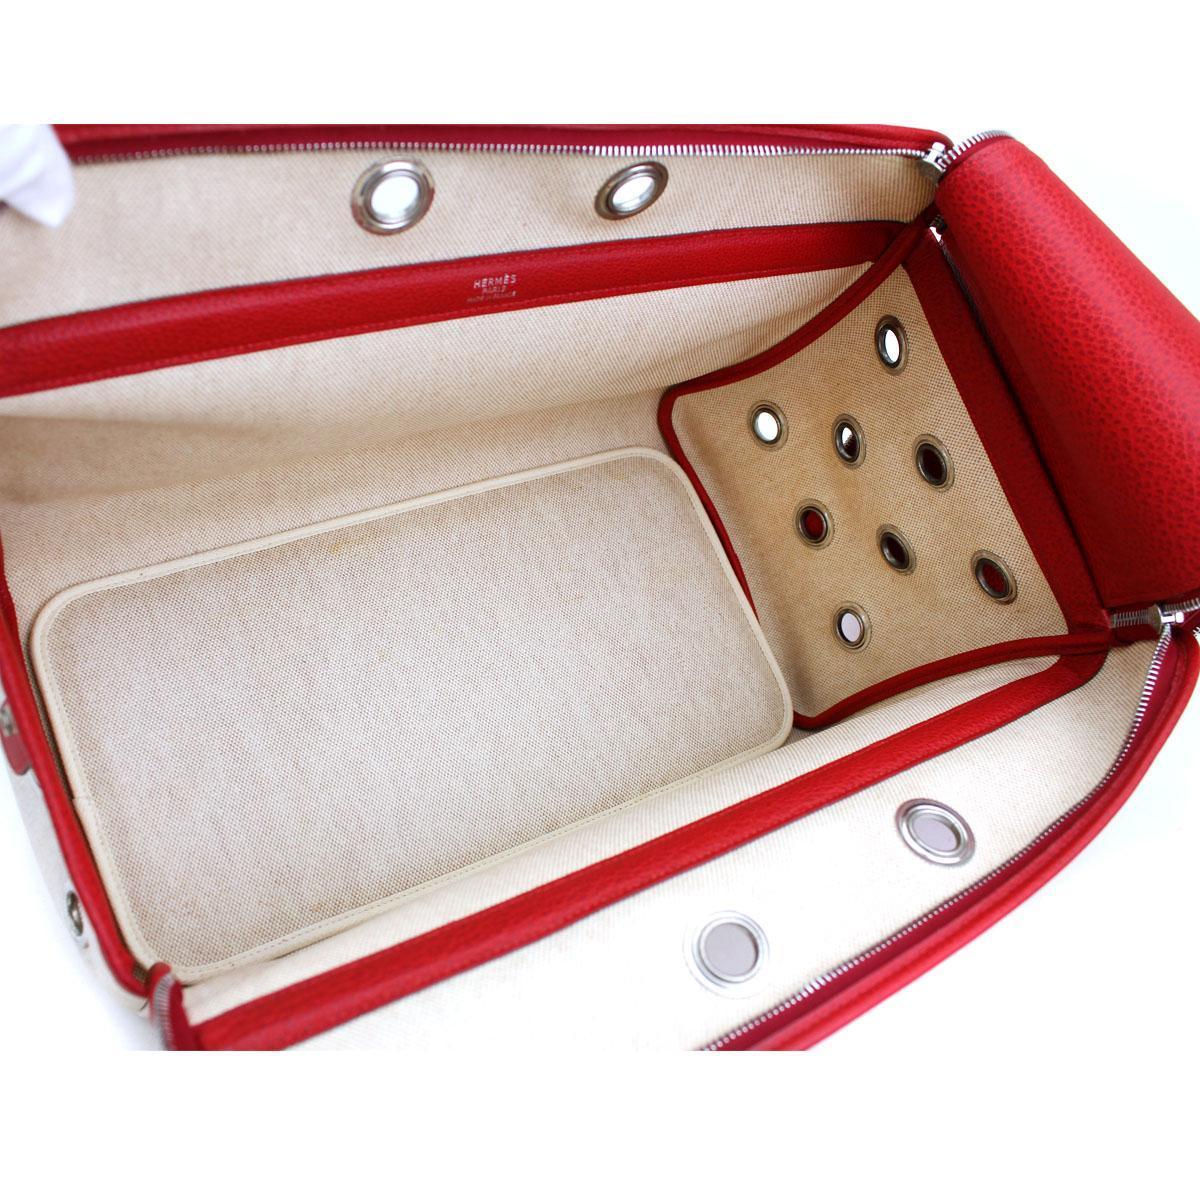 HERMES Paris Pet Dog Carrier Bag Case Sac De Transporte 2